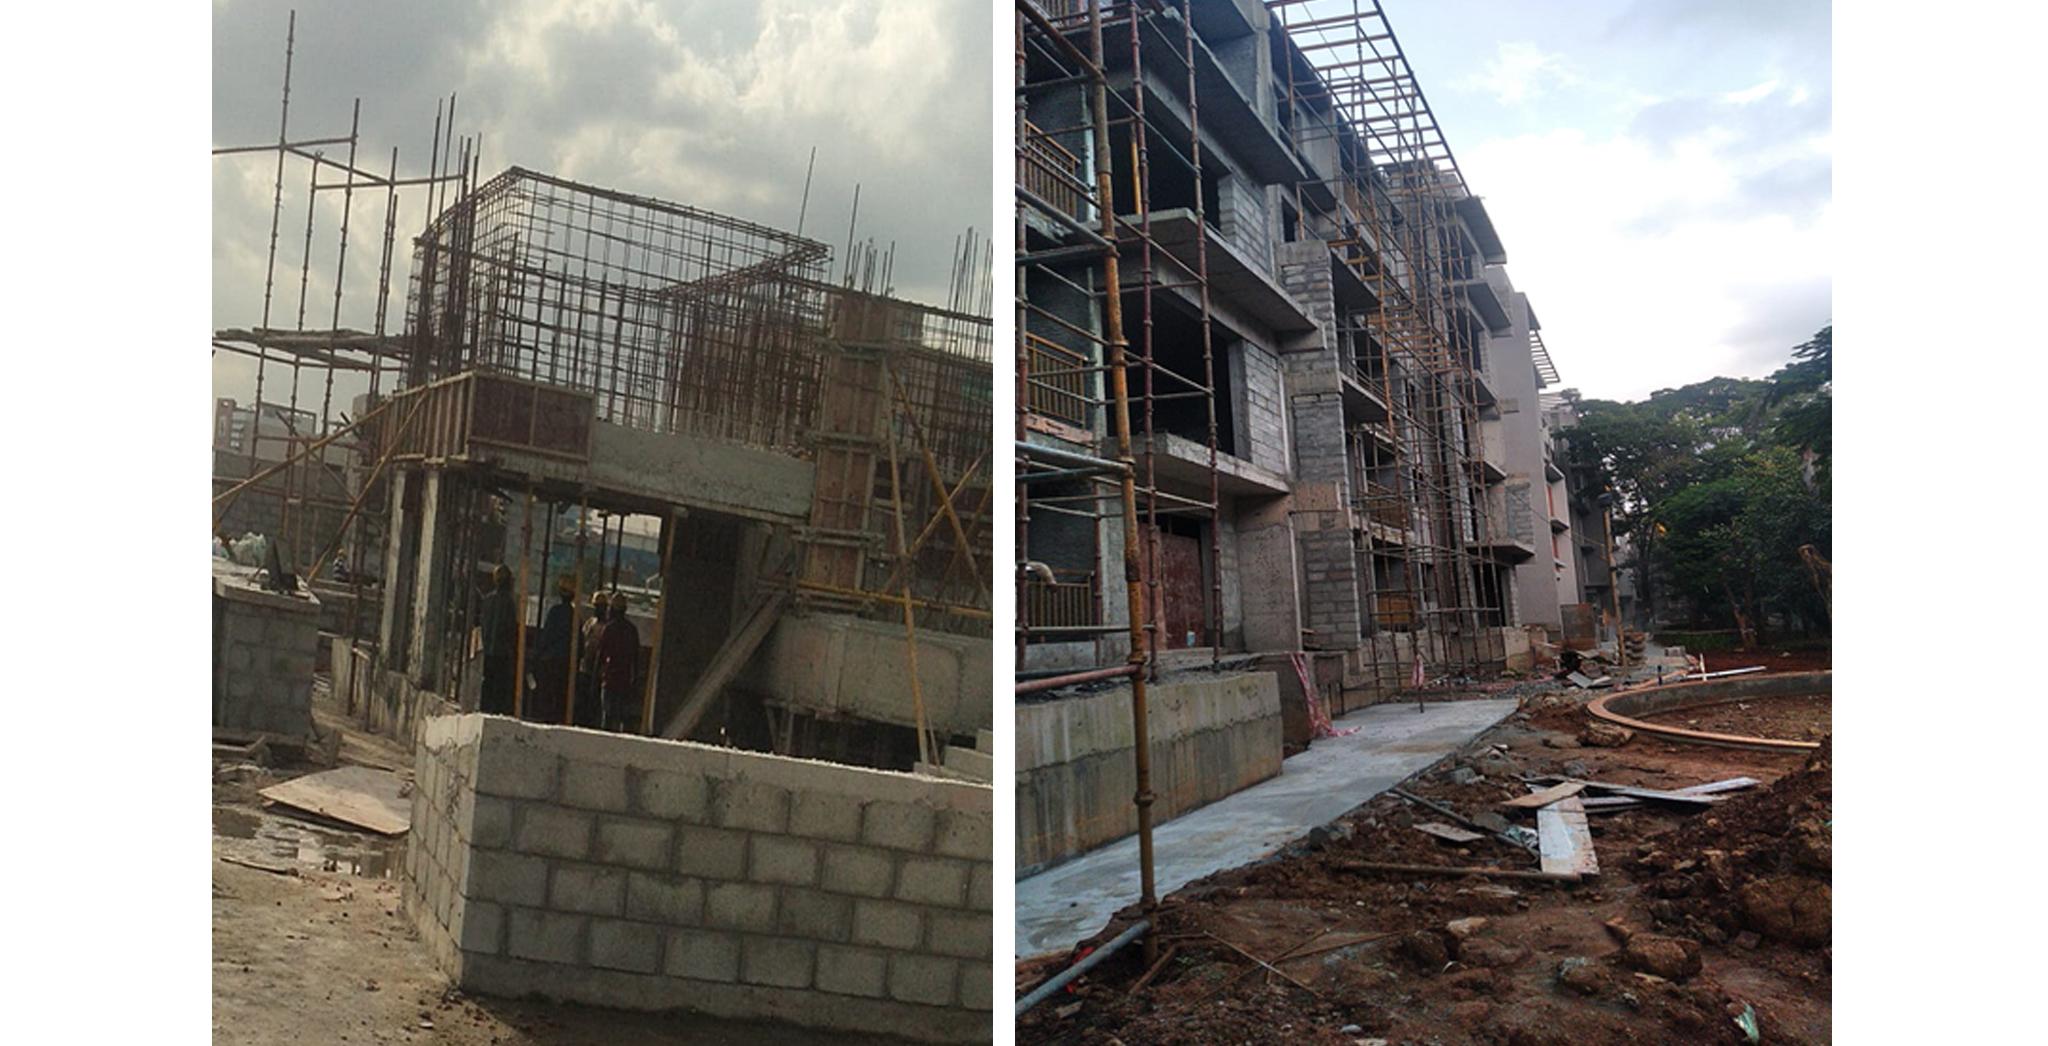 Sep 2021 - D Block: OHT Work in progress. South Elevation External Plastering work in progress